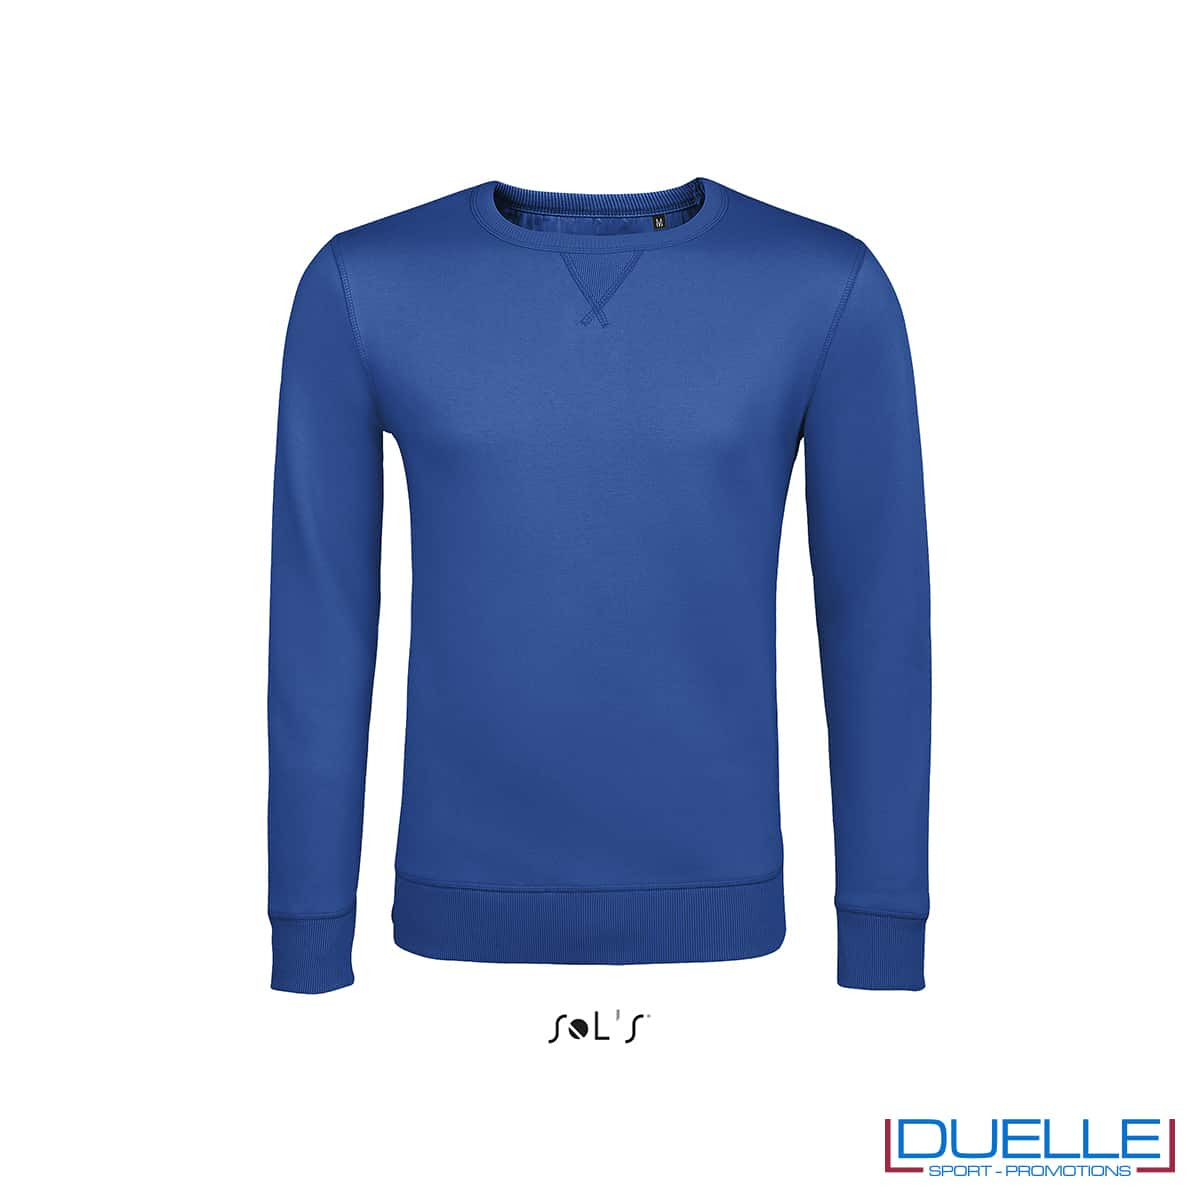 Felpa in cotone LSF colore blu royal